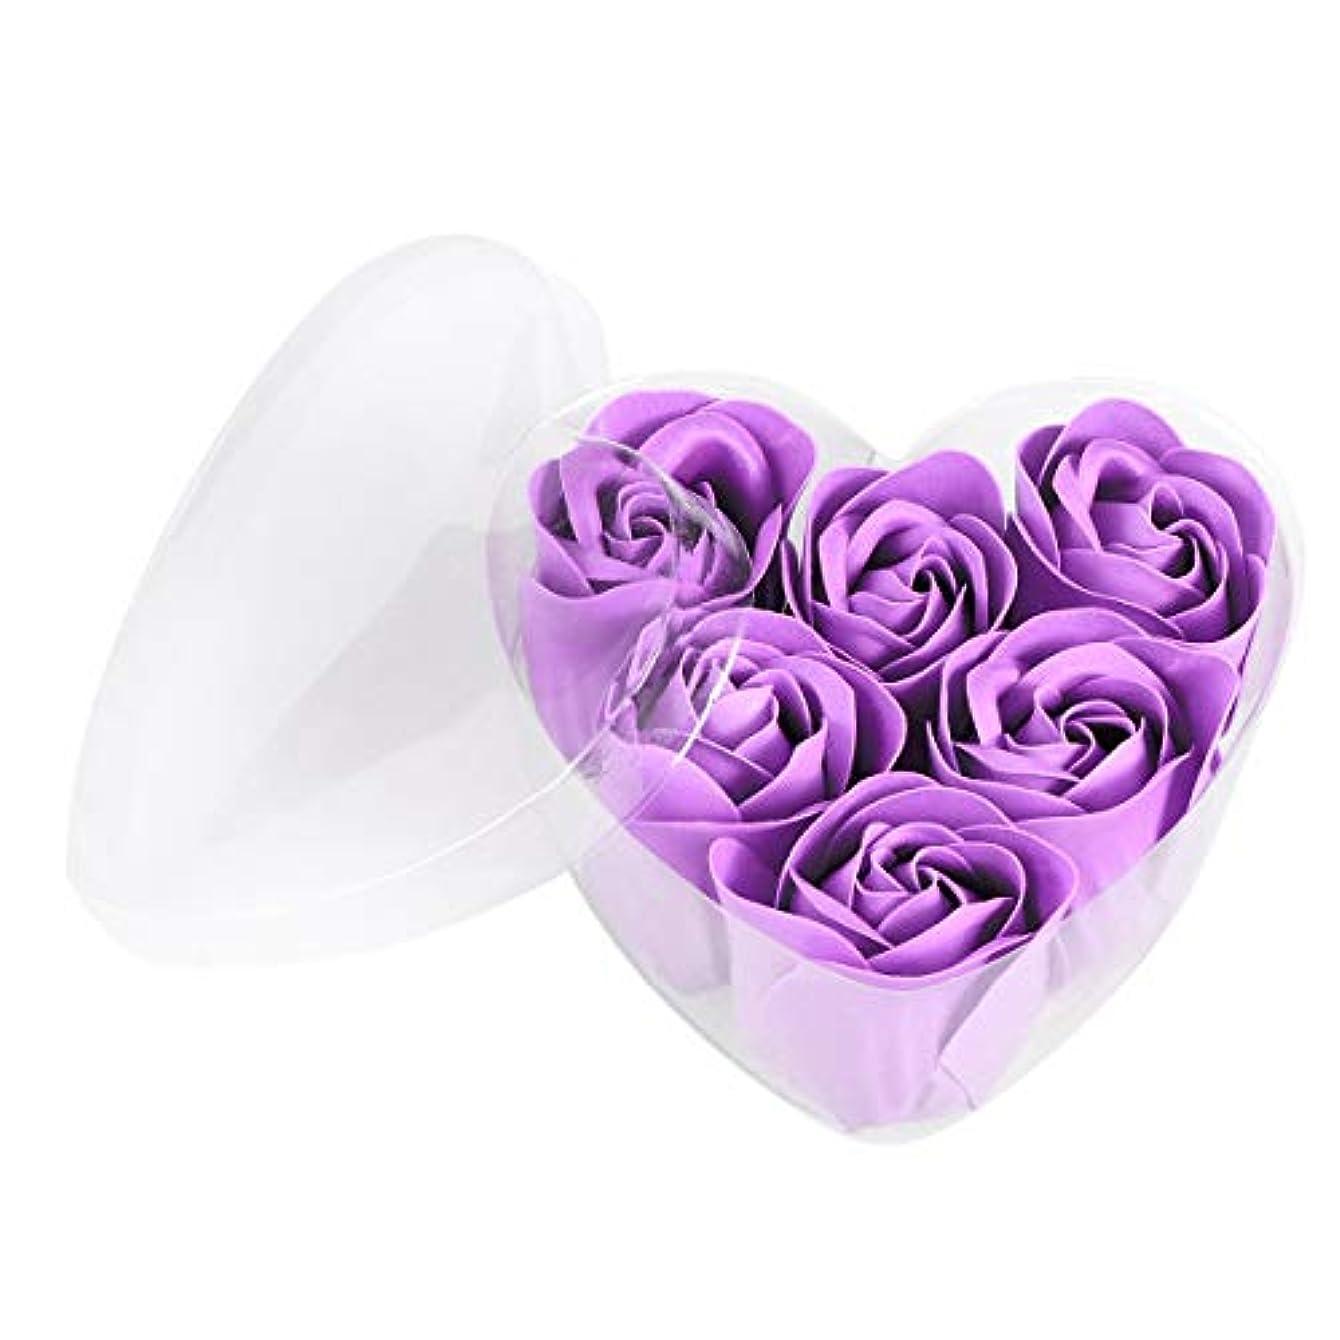 Beaupretty 6本シミュレーションローズソープハート型フラワーソープギフトボックス結婚式の誕生日Valentin's Day(紫)